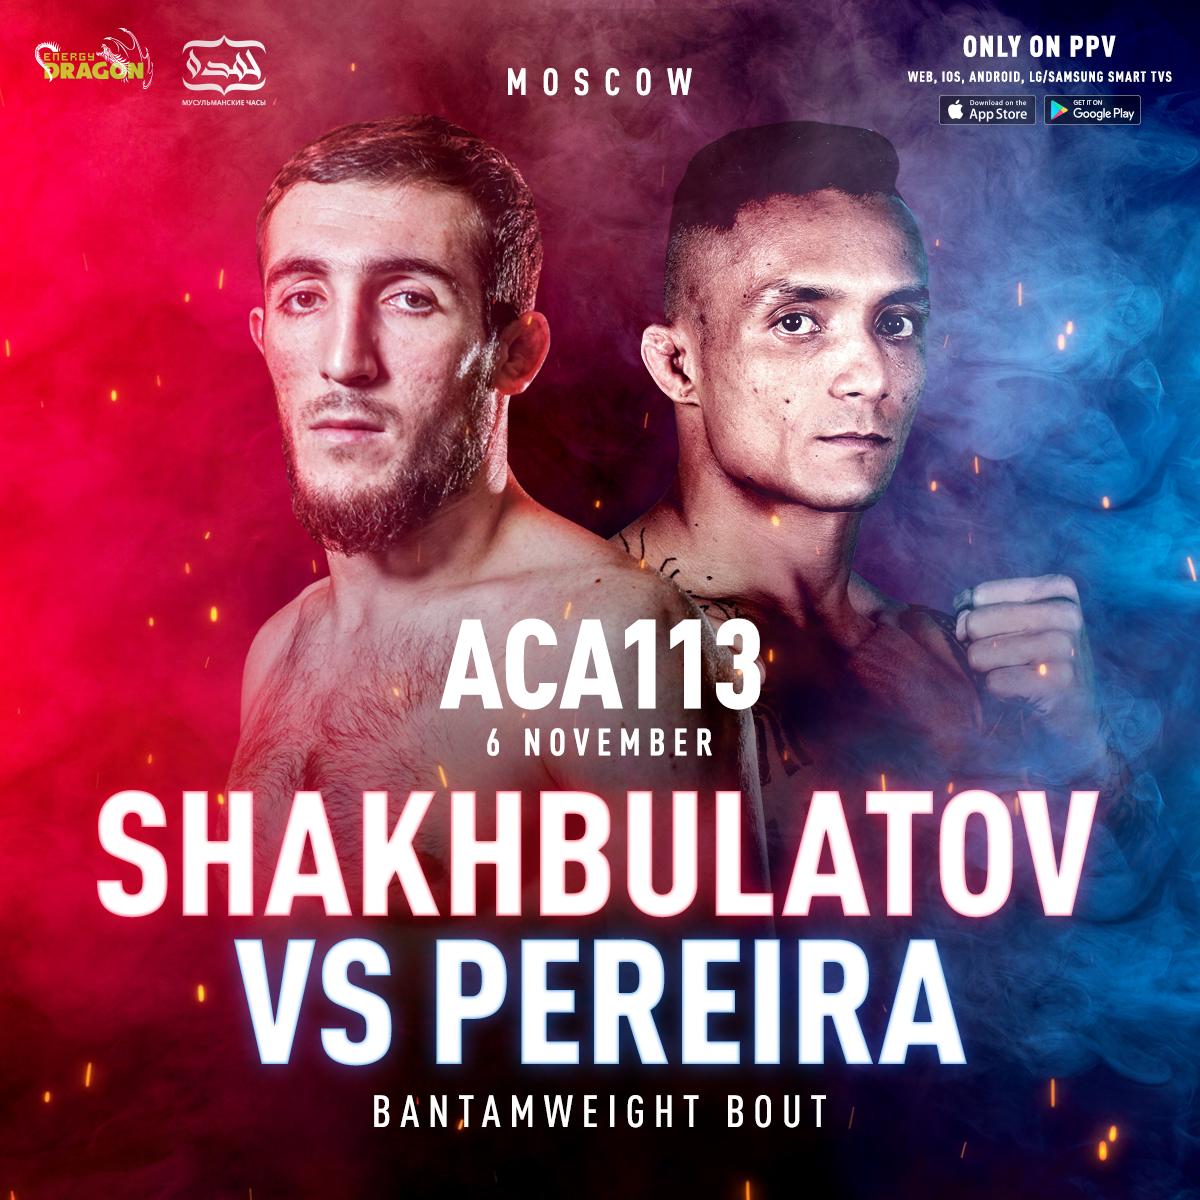 🔥 This battle will probably end real quick!  Shamil Shakhbulatov vs. Walter Pereira Junior on ACA 113. https://t.co/fNB3IZT0qV